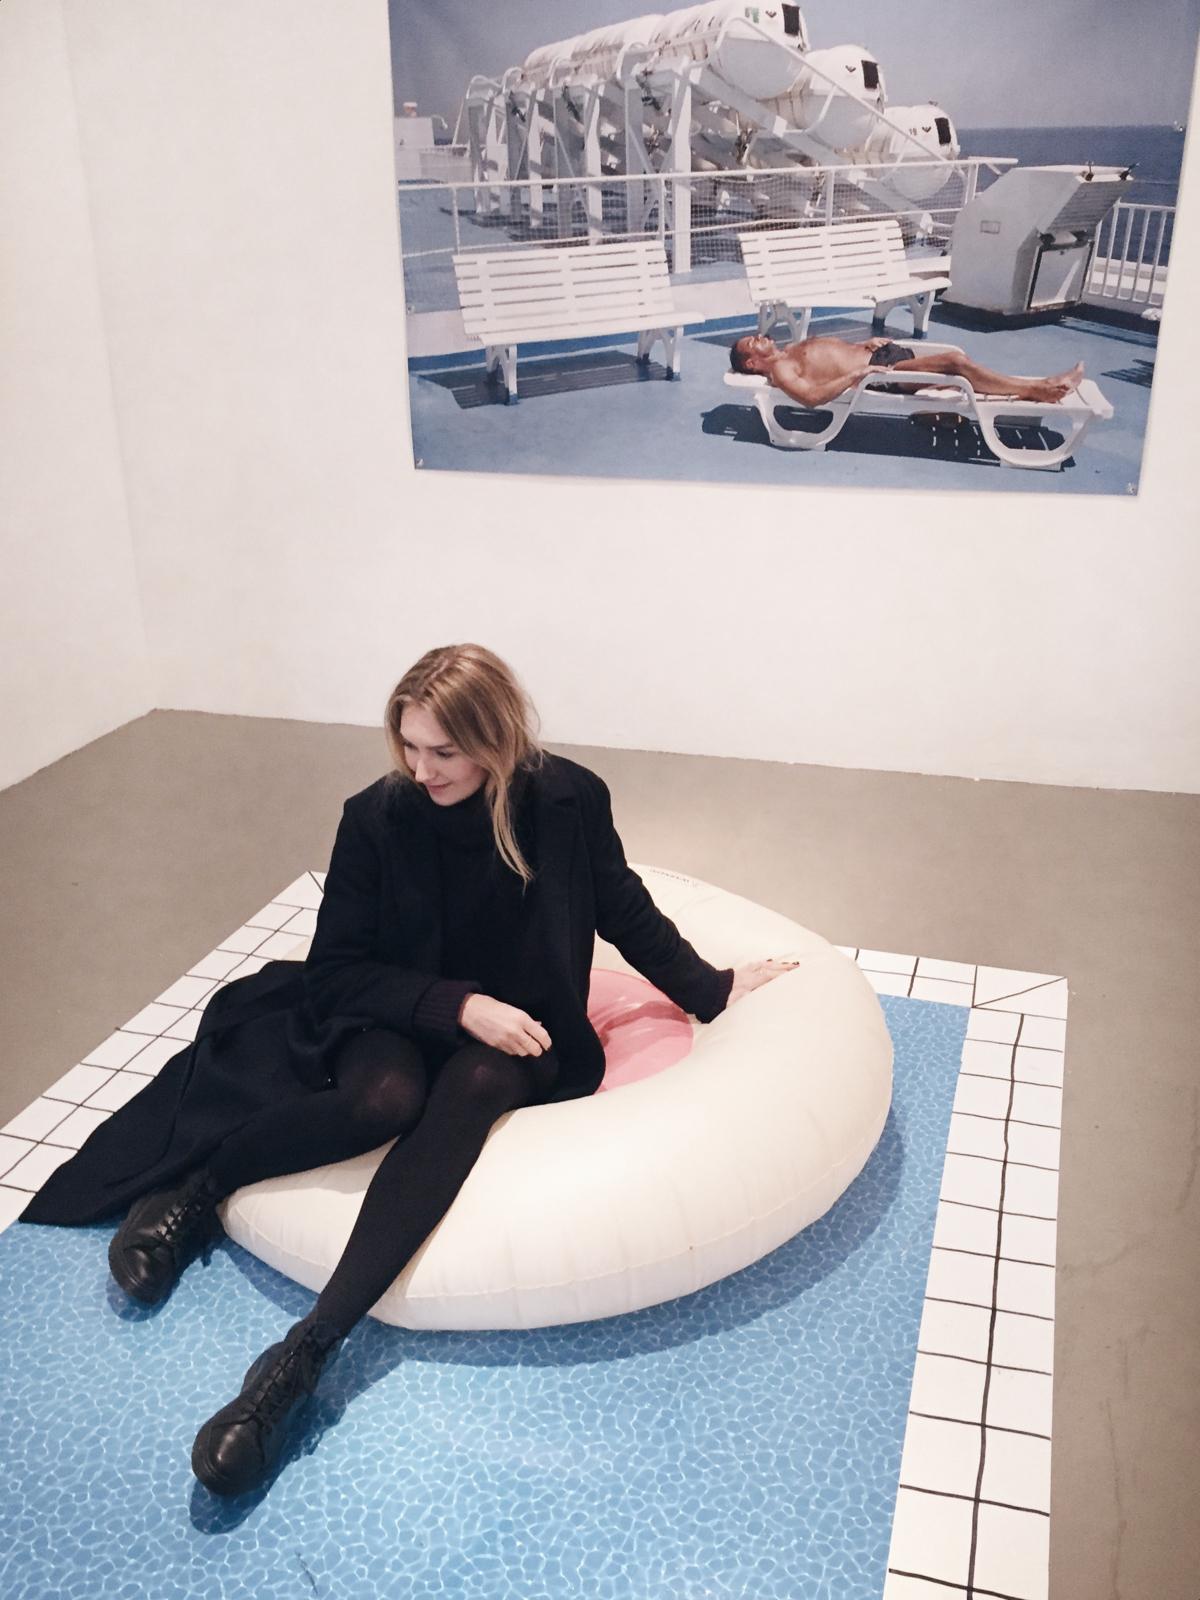 Beautyblog-Beauty-Blog-bare minds-Elina Neumann Ausstellung Berlin Kust Fotografie igant HVW( Gallerie Peaks of the Weeks No8 1